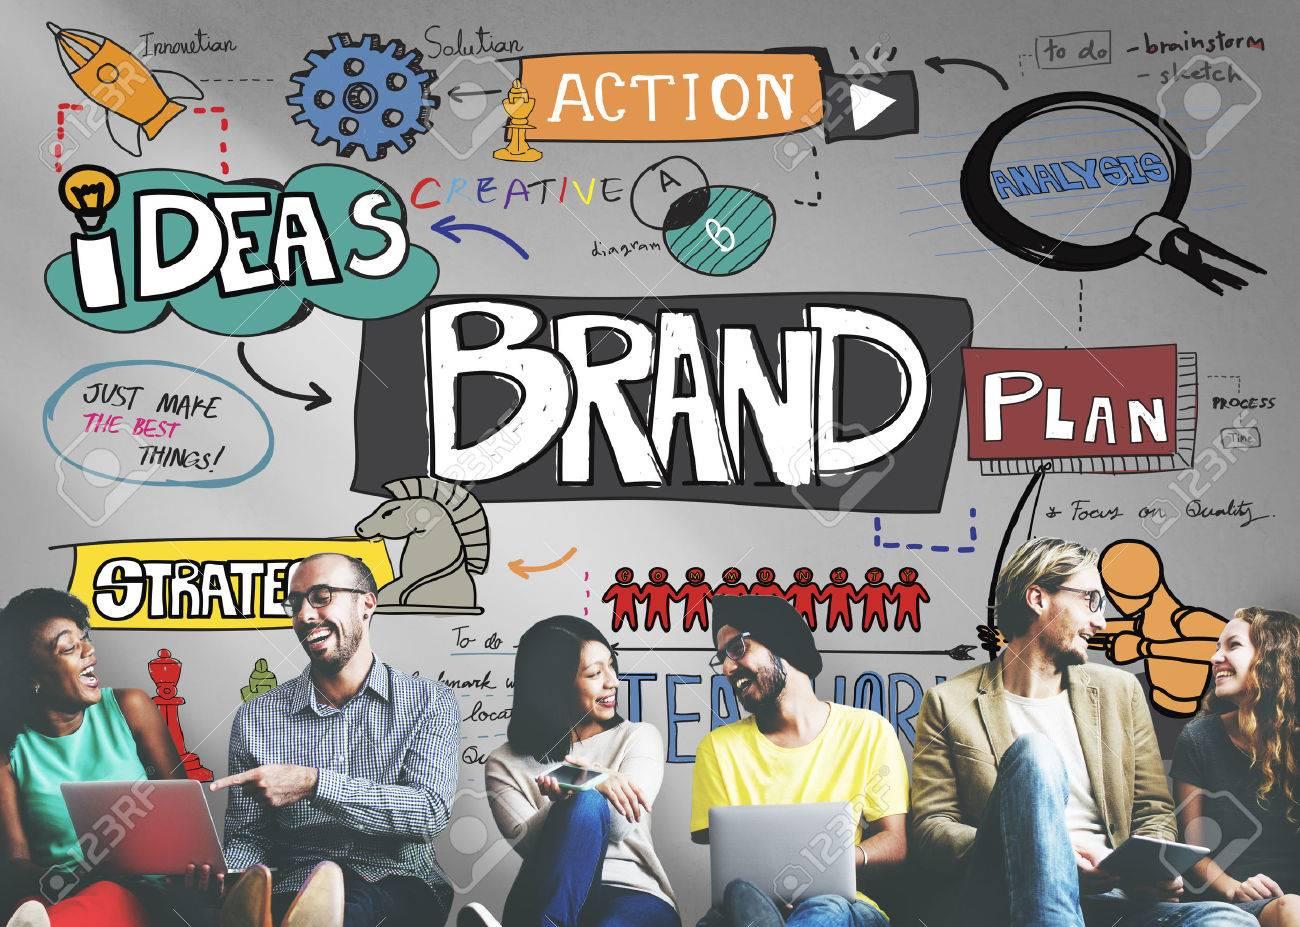 Brand Branding Strategy Marketing Creative Concept - 55440100